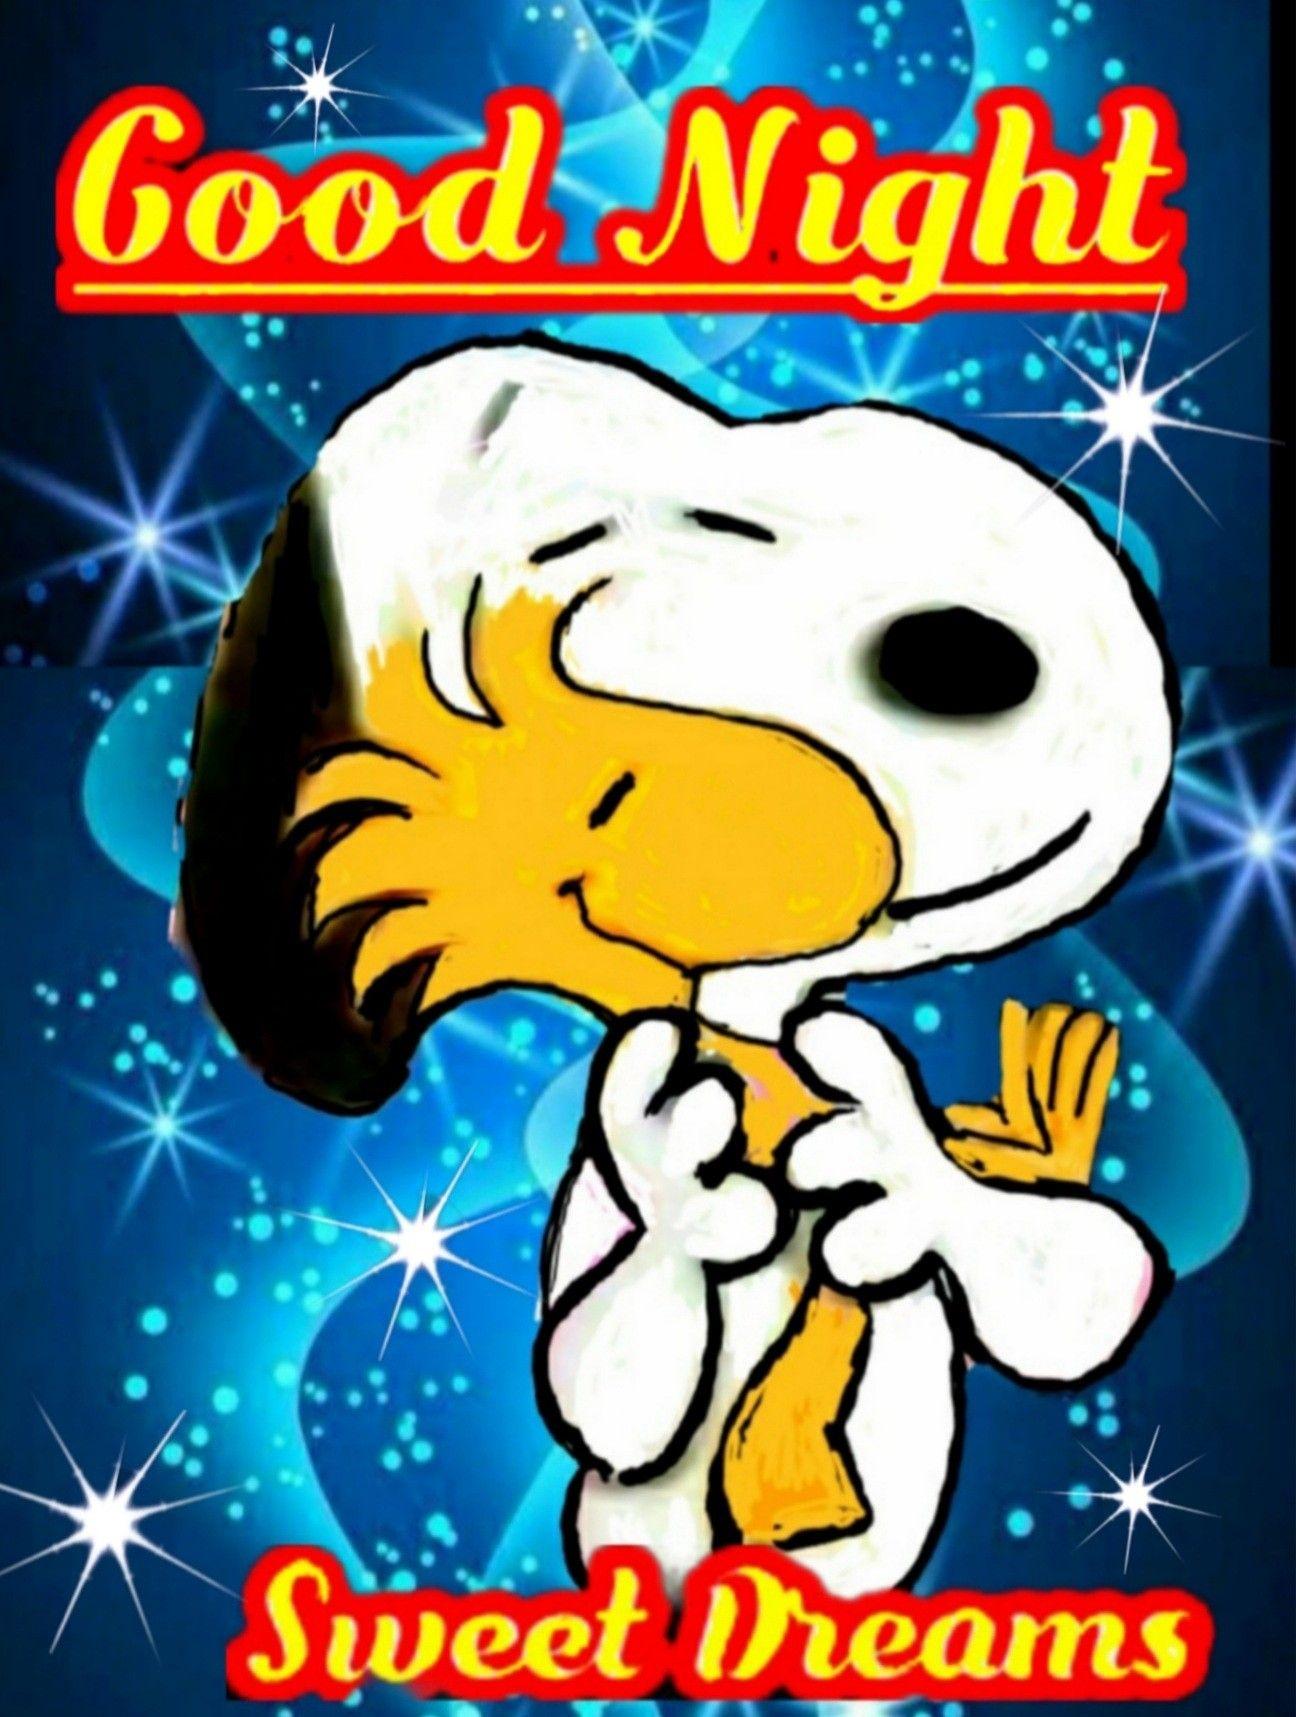 Good Night Cartoon : night, cartoon, スヌーピー(good-night), Goodnight, Snoopy,, Snoopy, Christmas,, Funny